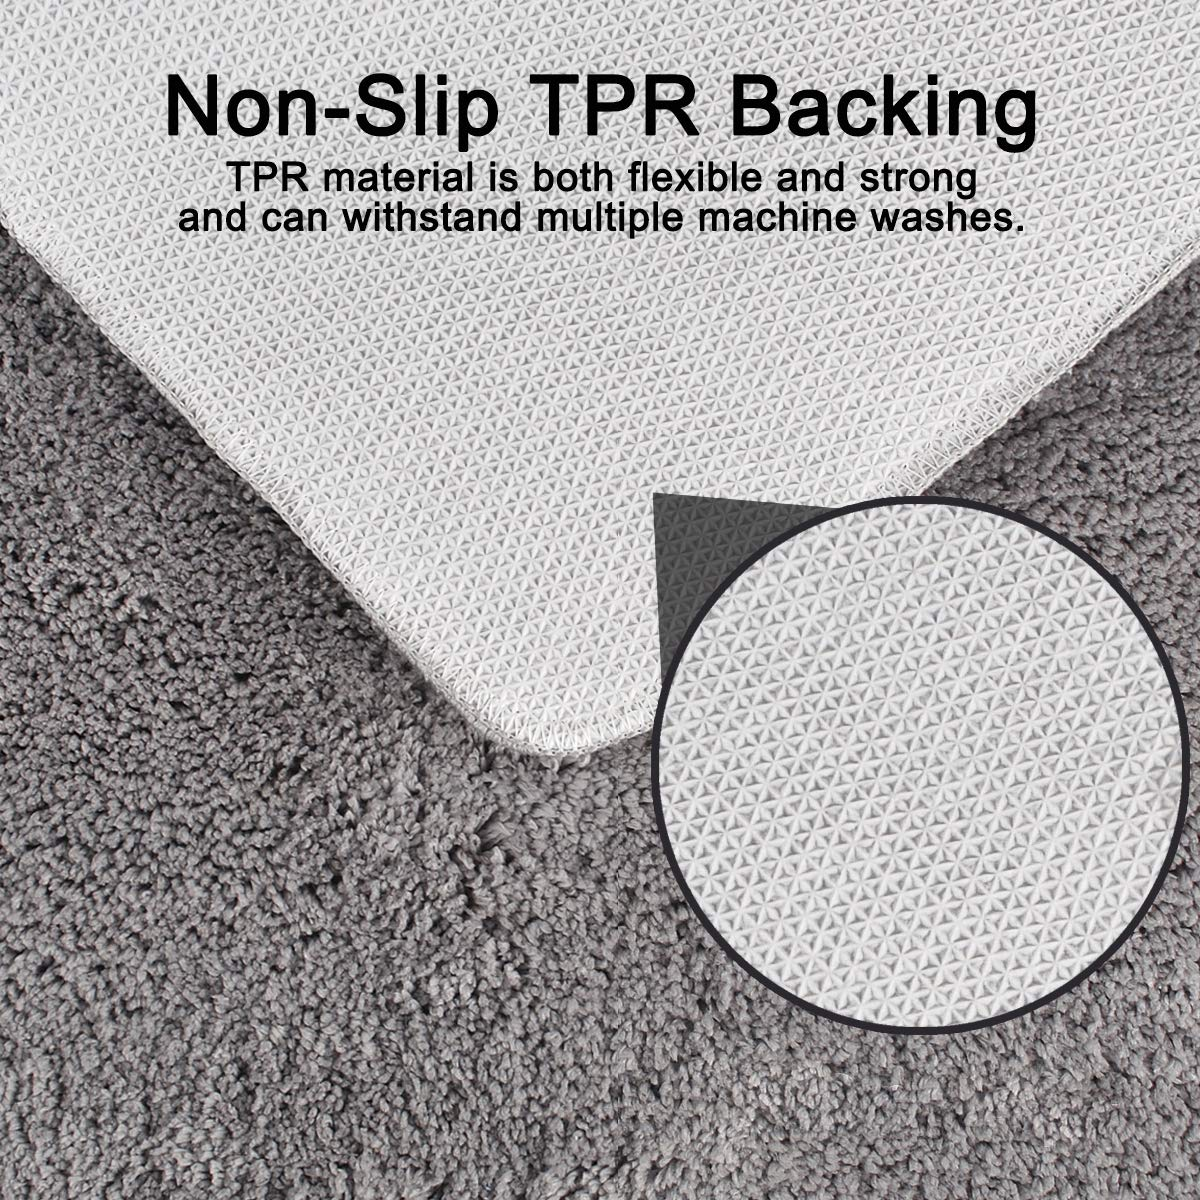 Bathroom Rugs 2-Pack TPR Non-Slip Bath Mat Water Absorbent Microfiber Plush Carpet Shaggy Floor Mat for Tub Shower Kitchen Balcony 27.6x16.9in